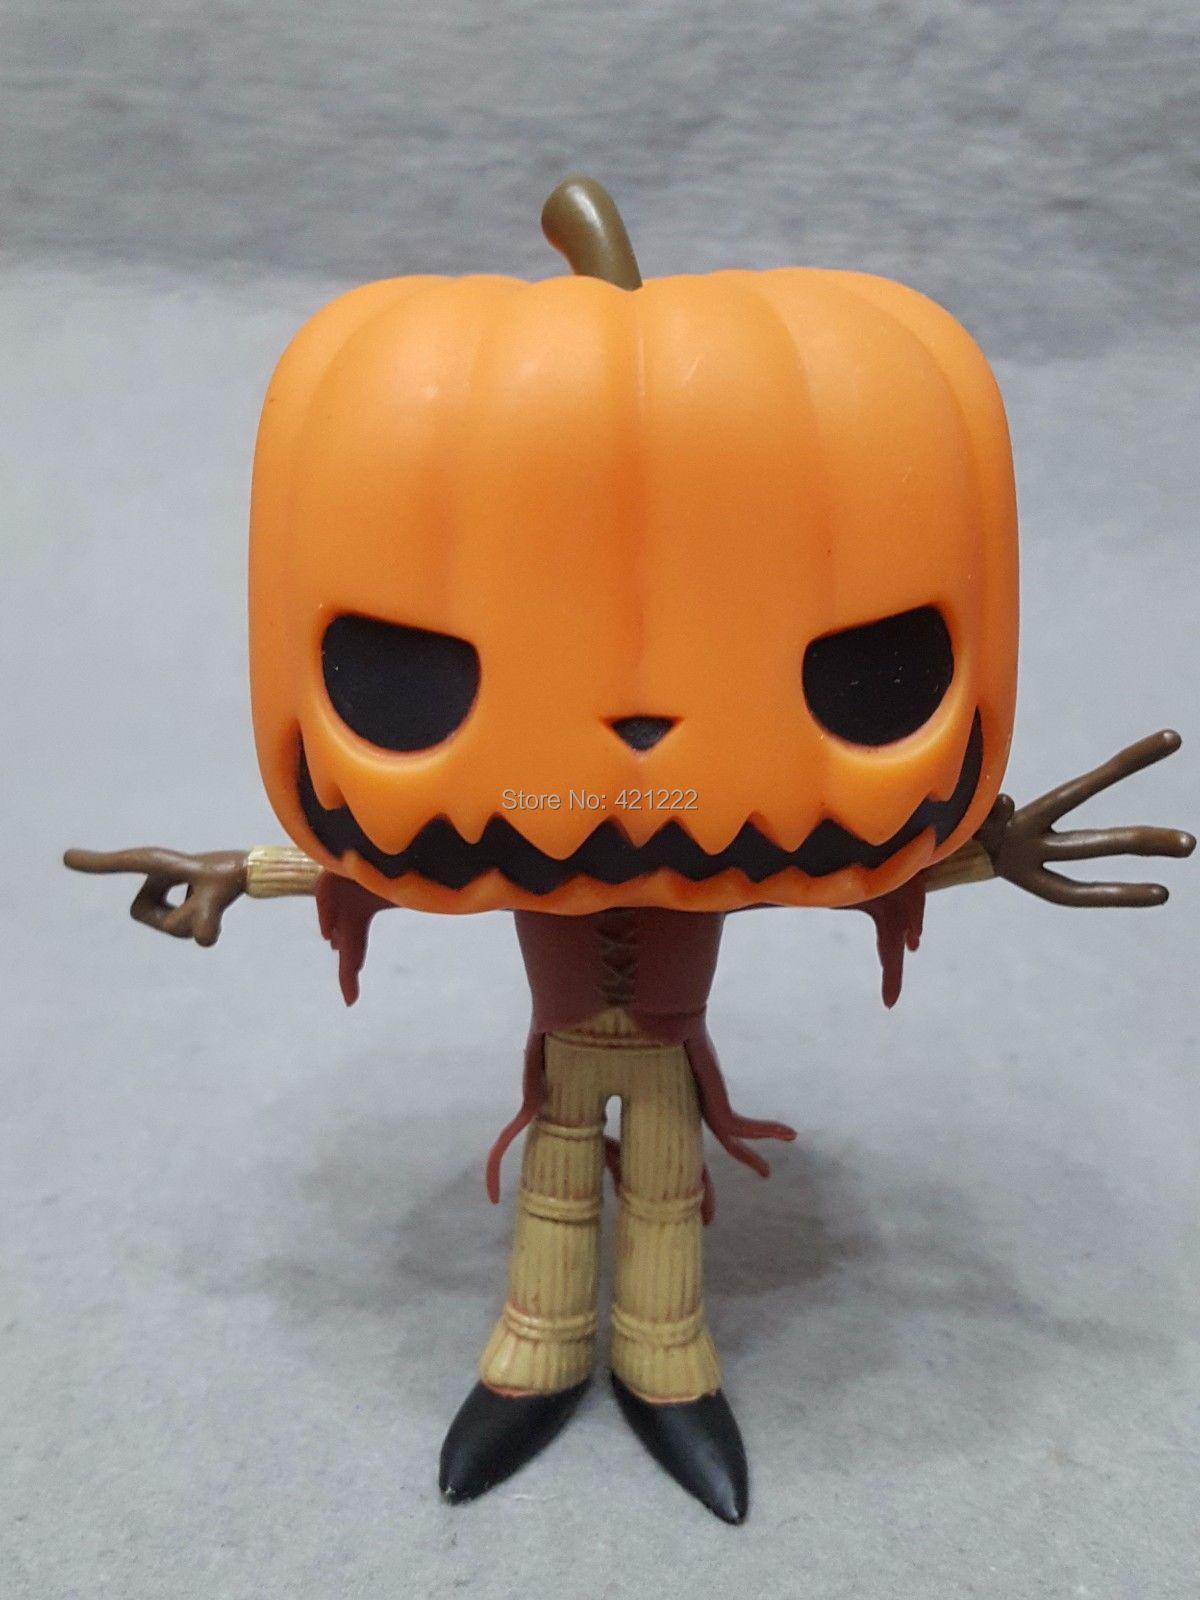 NO BOX ORIGINAL FUNKO POP! Pumpkin King Nightmare Before Christmas ...